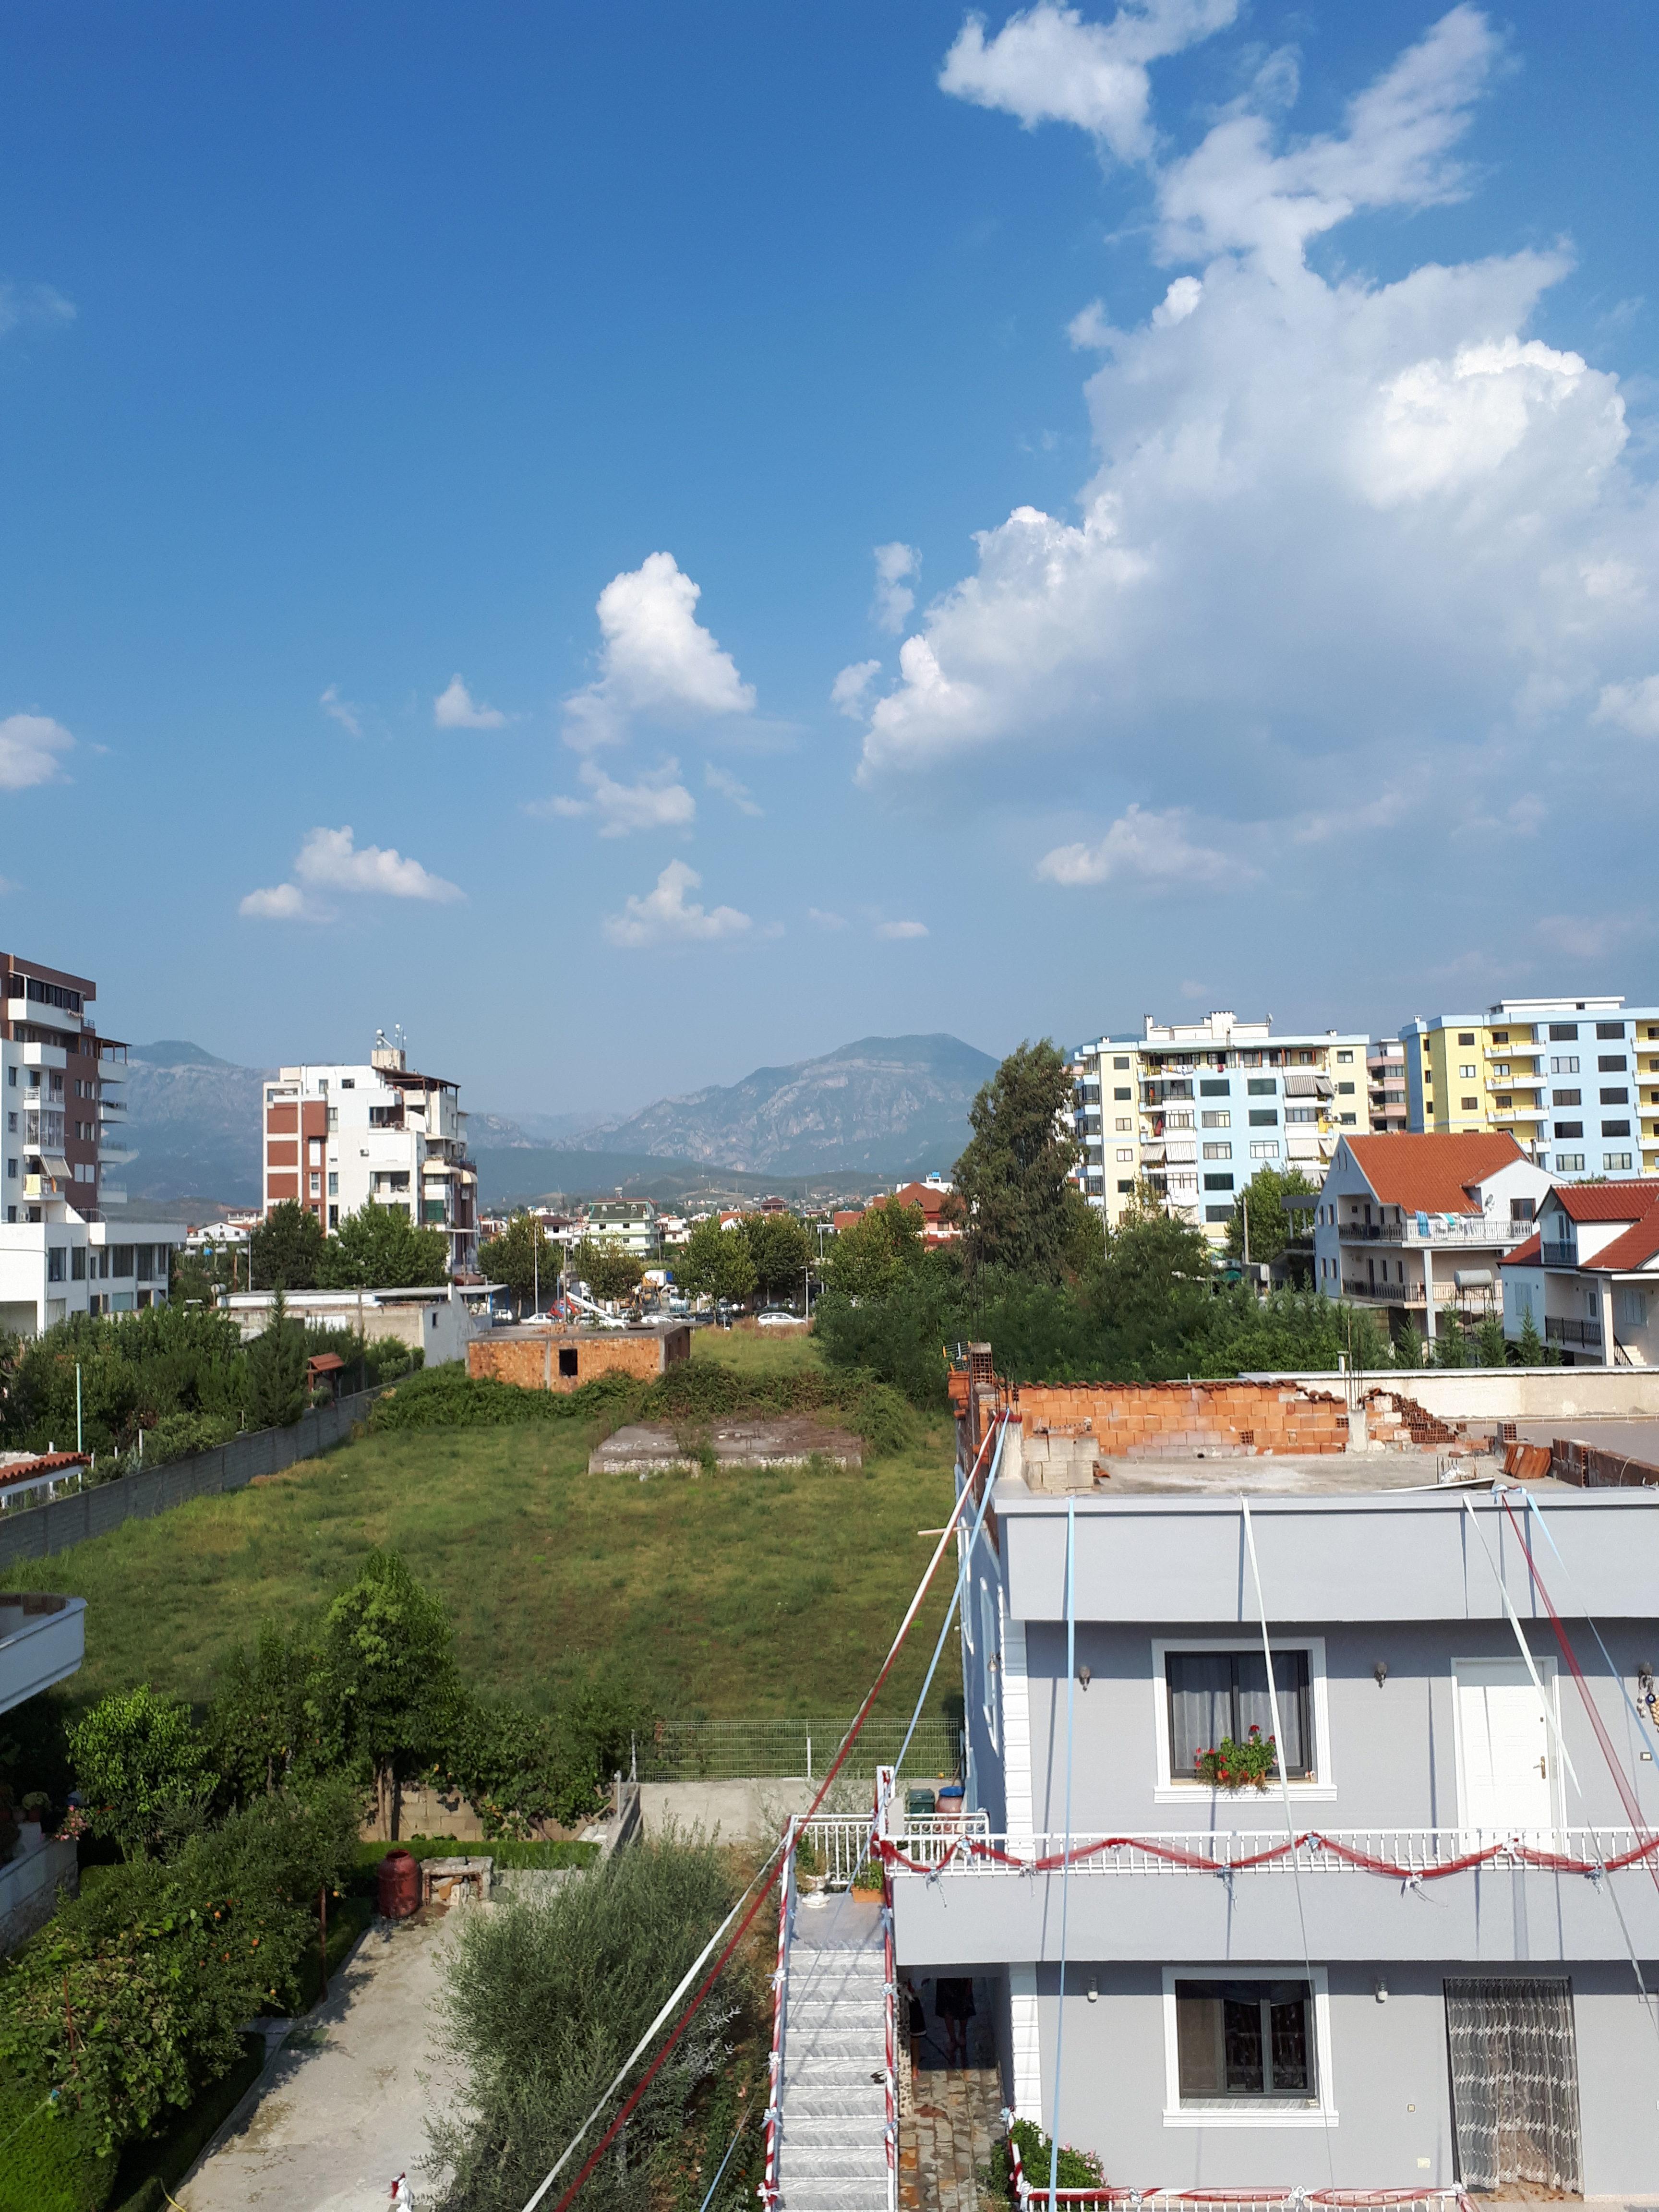 Ihana, sekava Albania